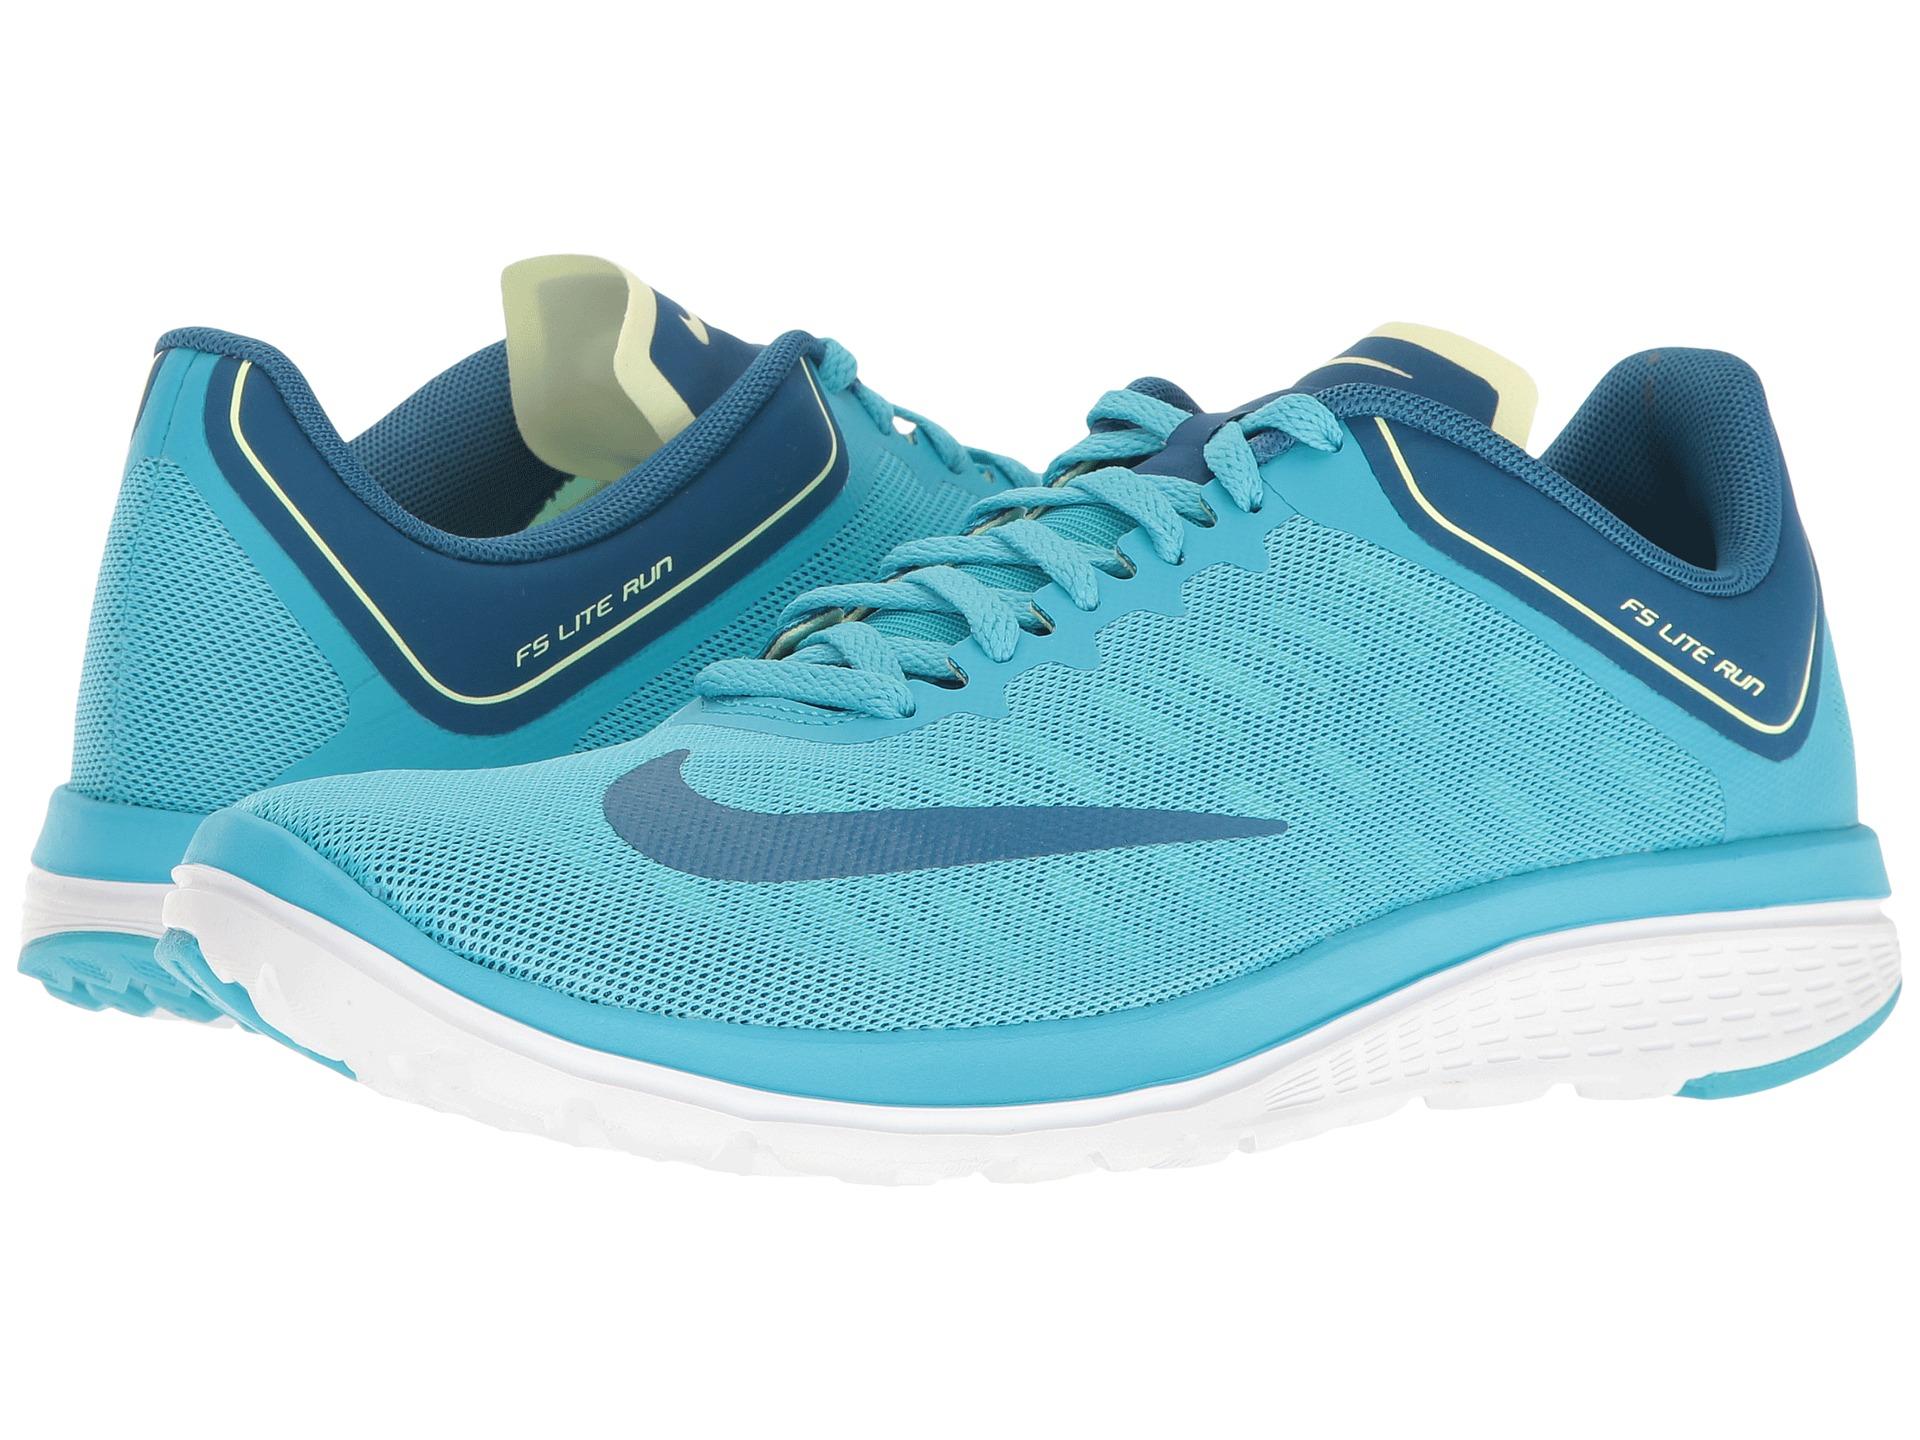 Nike Fs Lite Run 3 Premium Black Fierce Purple Clear Jade White